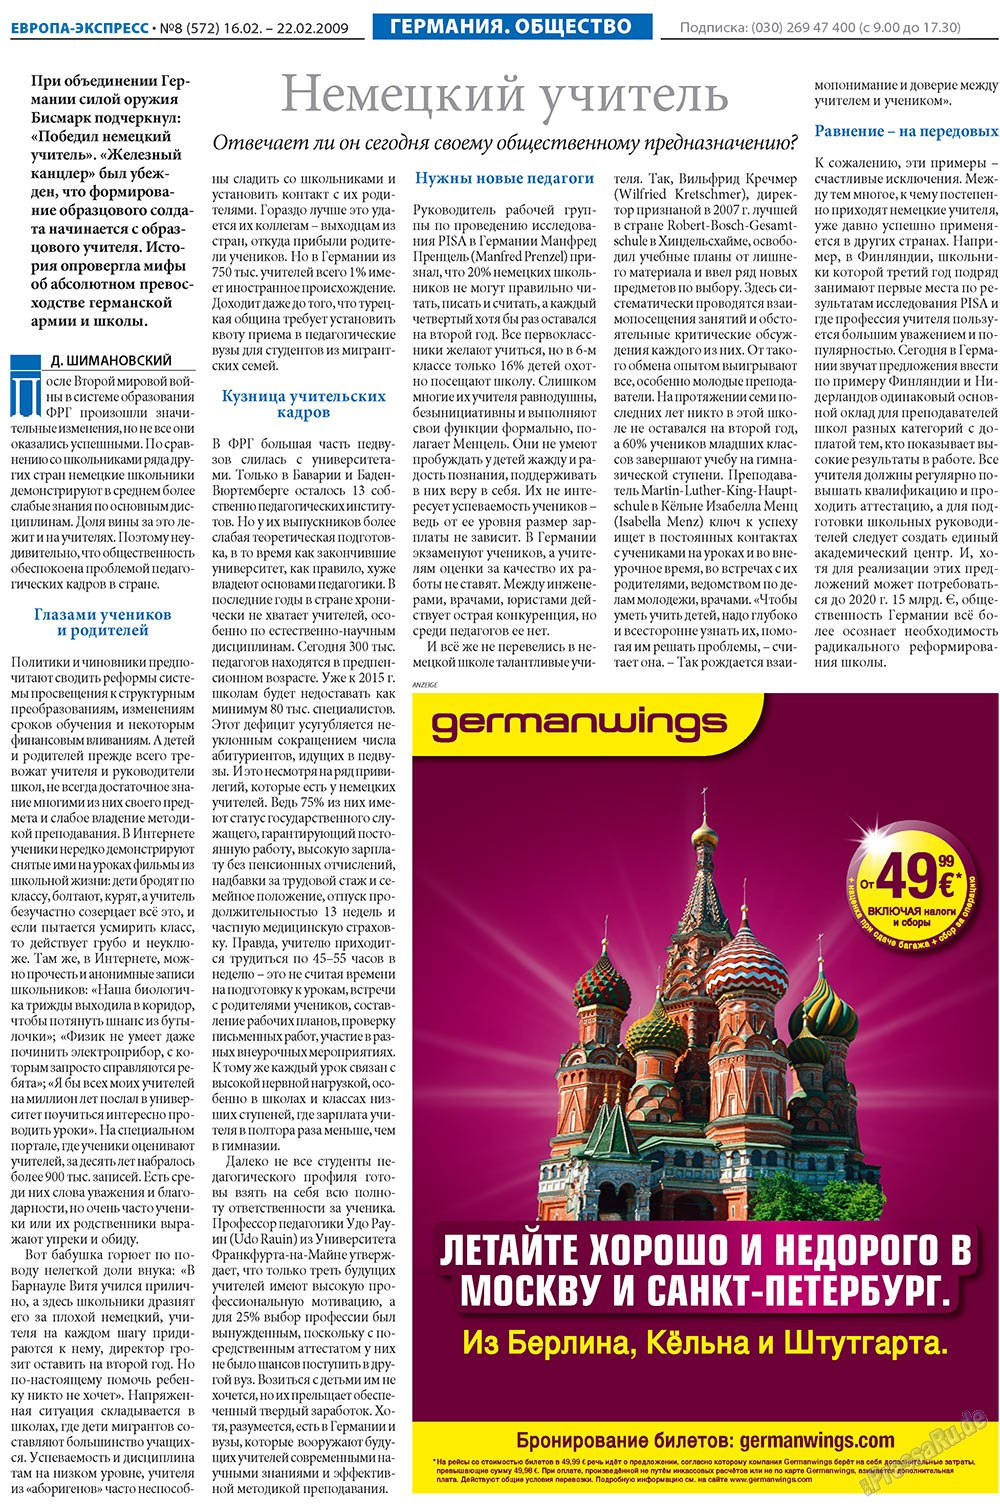 Европа экспресс (газета). 2009 год, номер 8, стр. 5